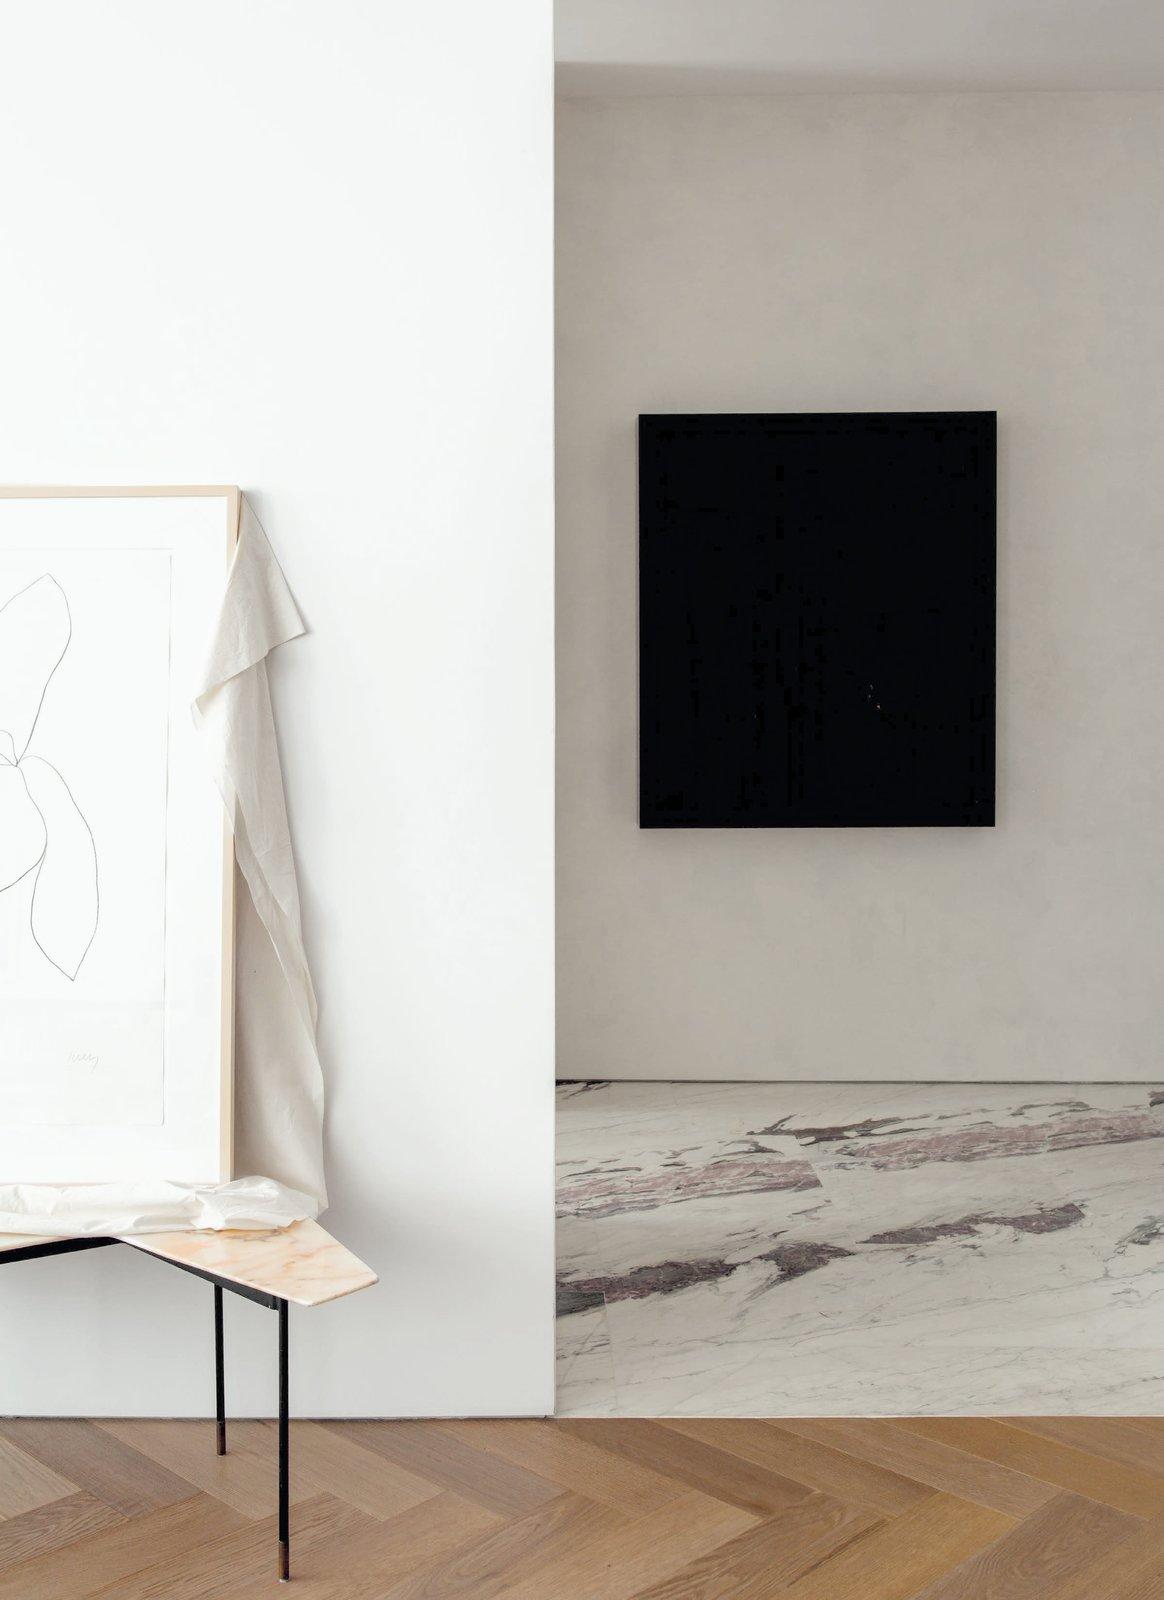 Hallway, Medium Hardwood Floor, and Marble Floor  Photo 6 of 6 in Fashion Designer Philip Lim's NYC Loft Is a Book-Filled Oasis